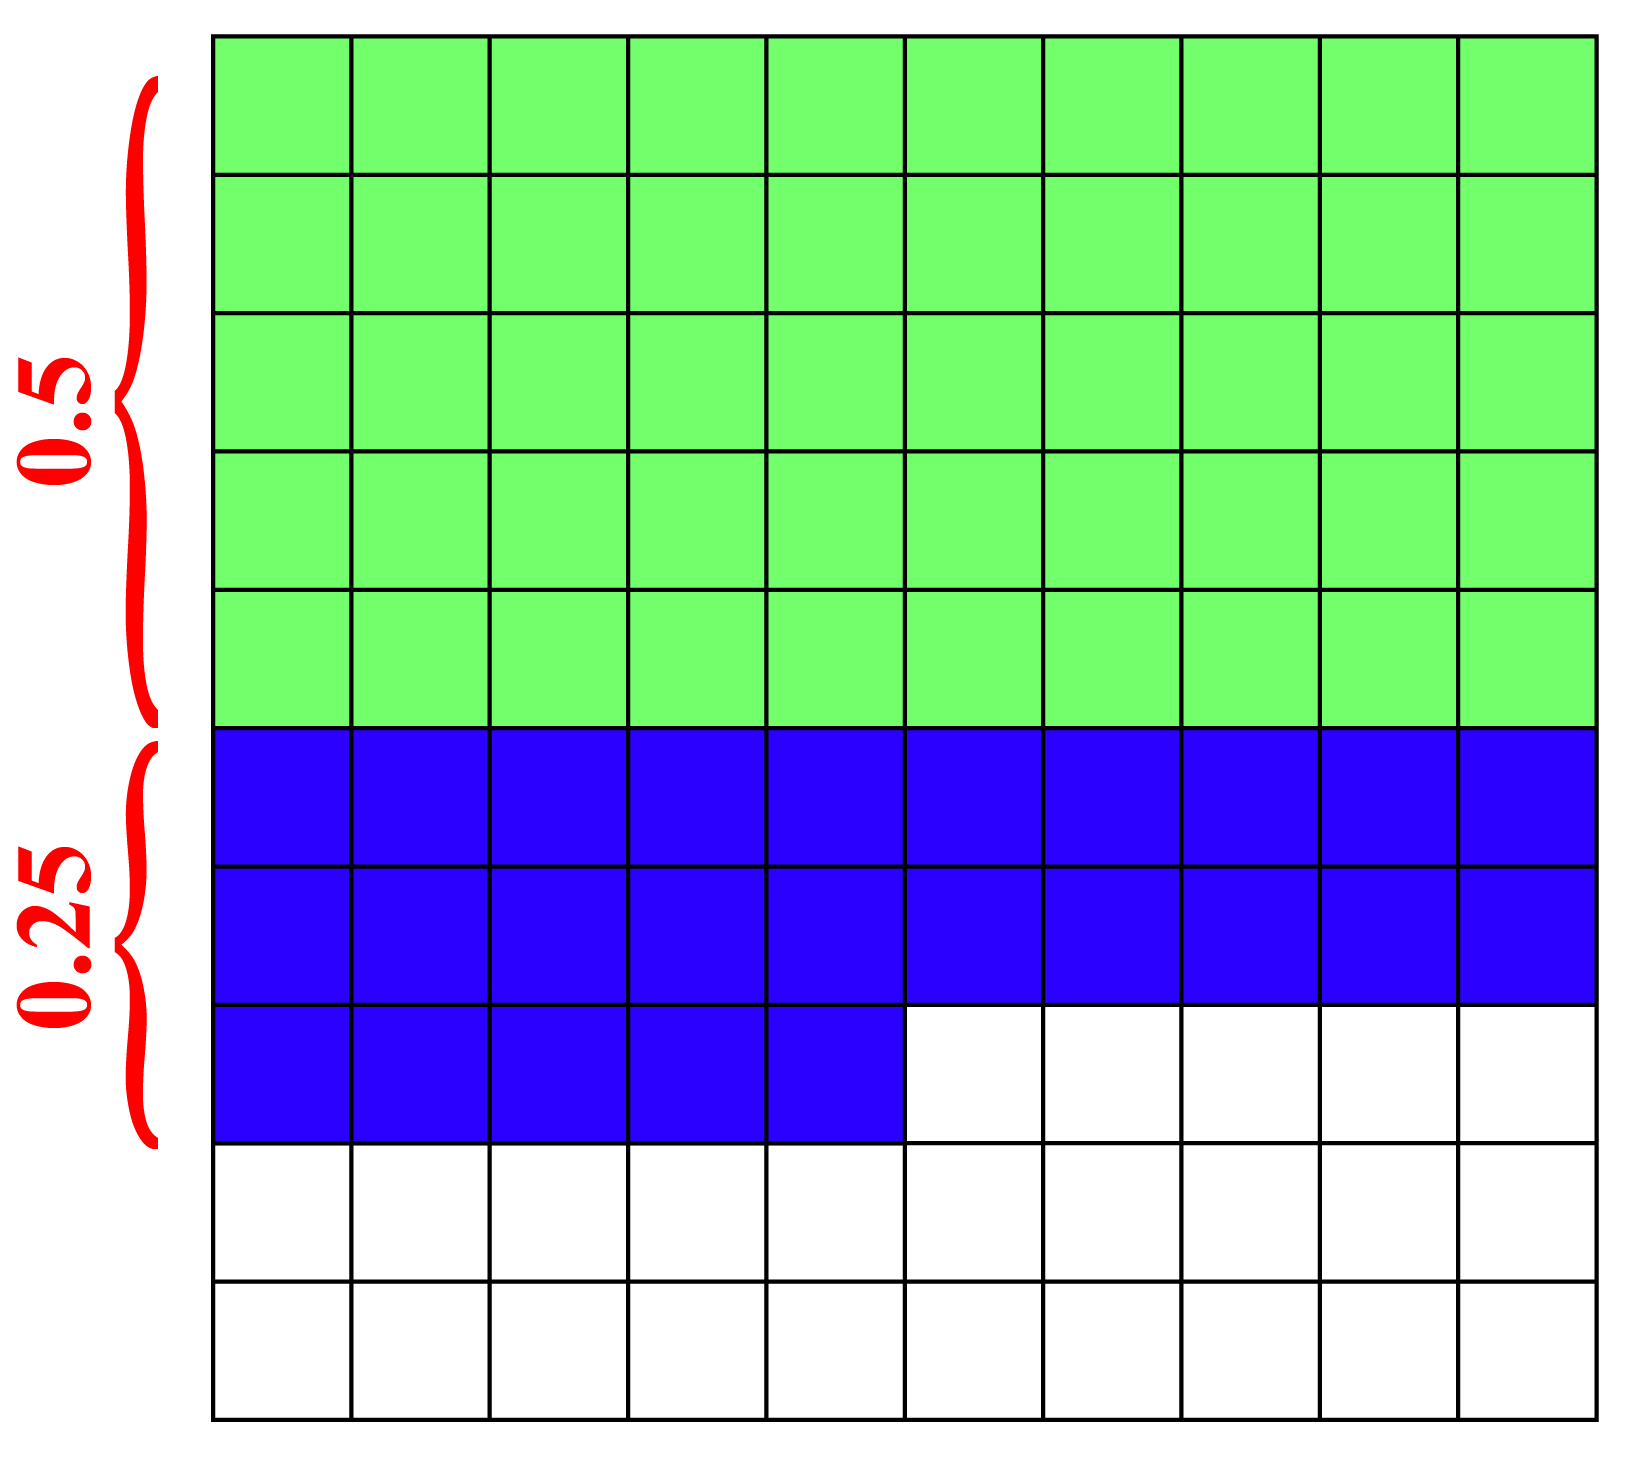 visualize 0.75